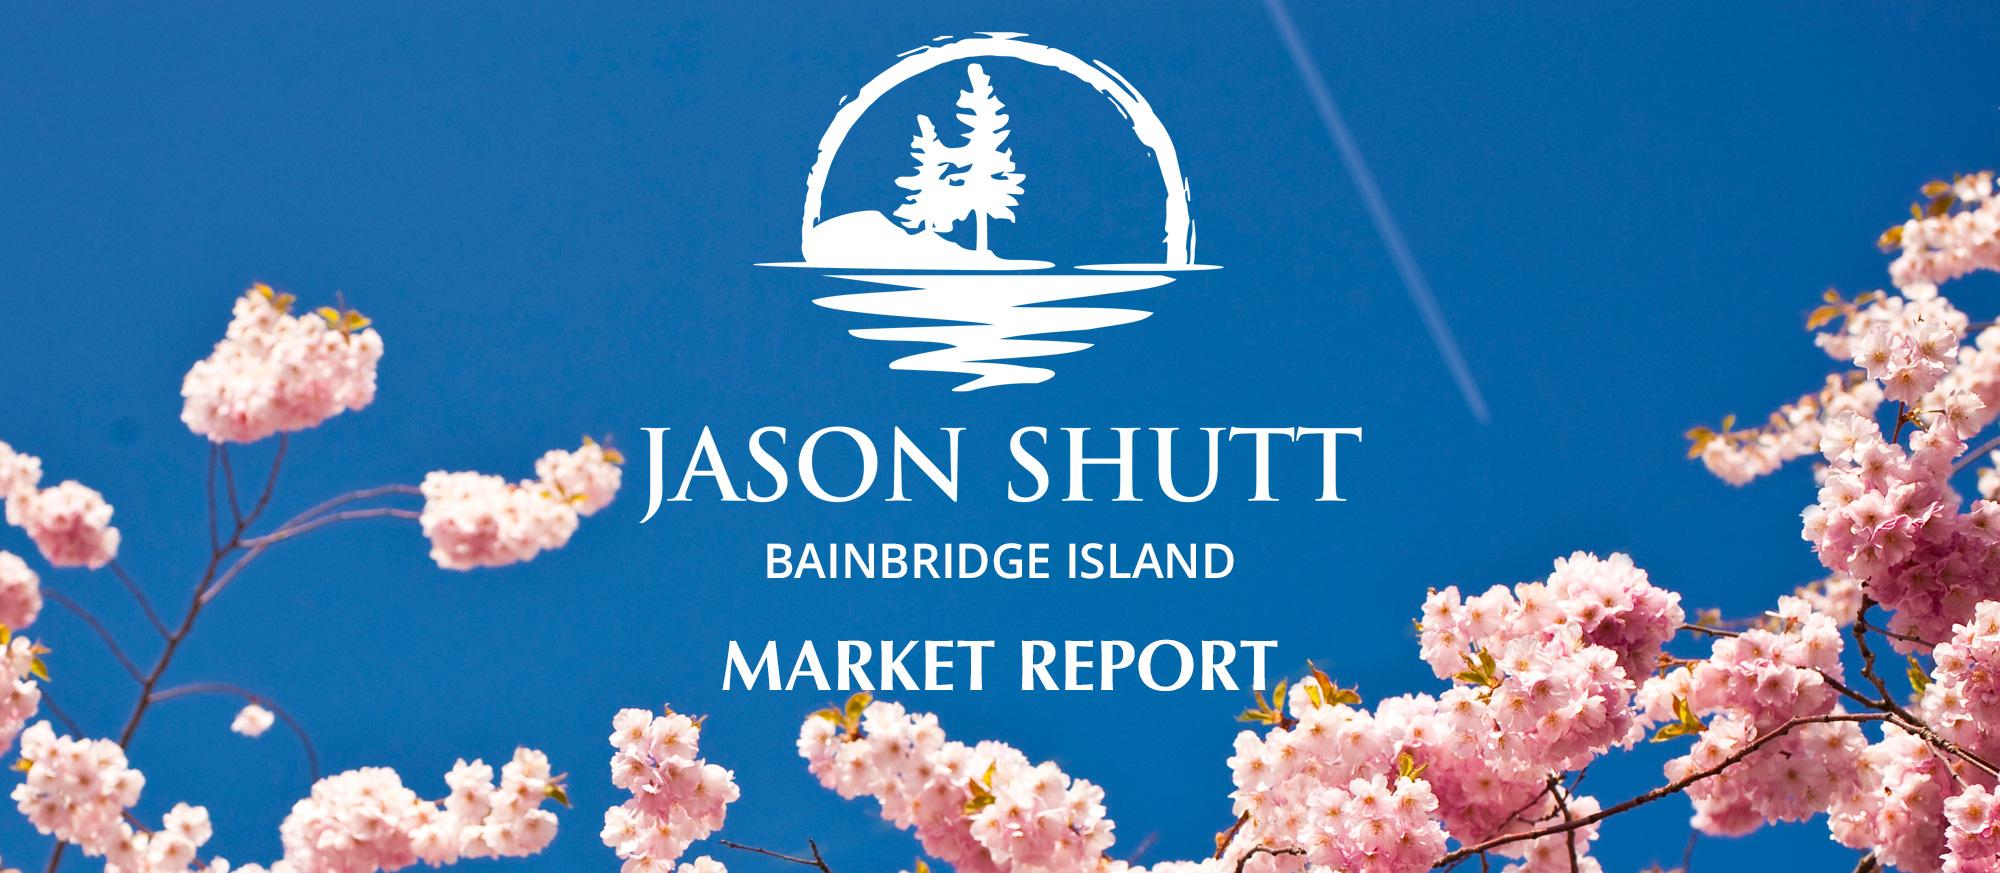 cherry-tree-blossoms-april-2021-top-jason-fixed.jpg